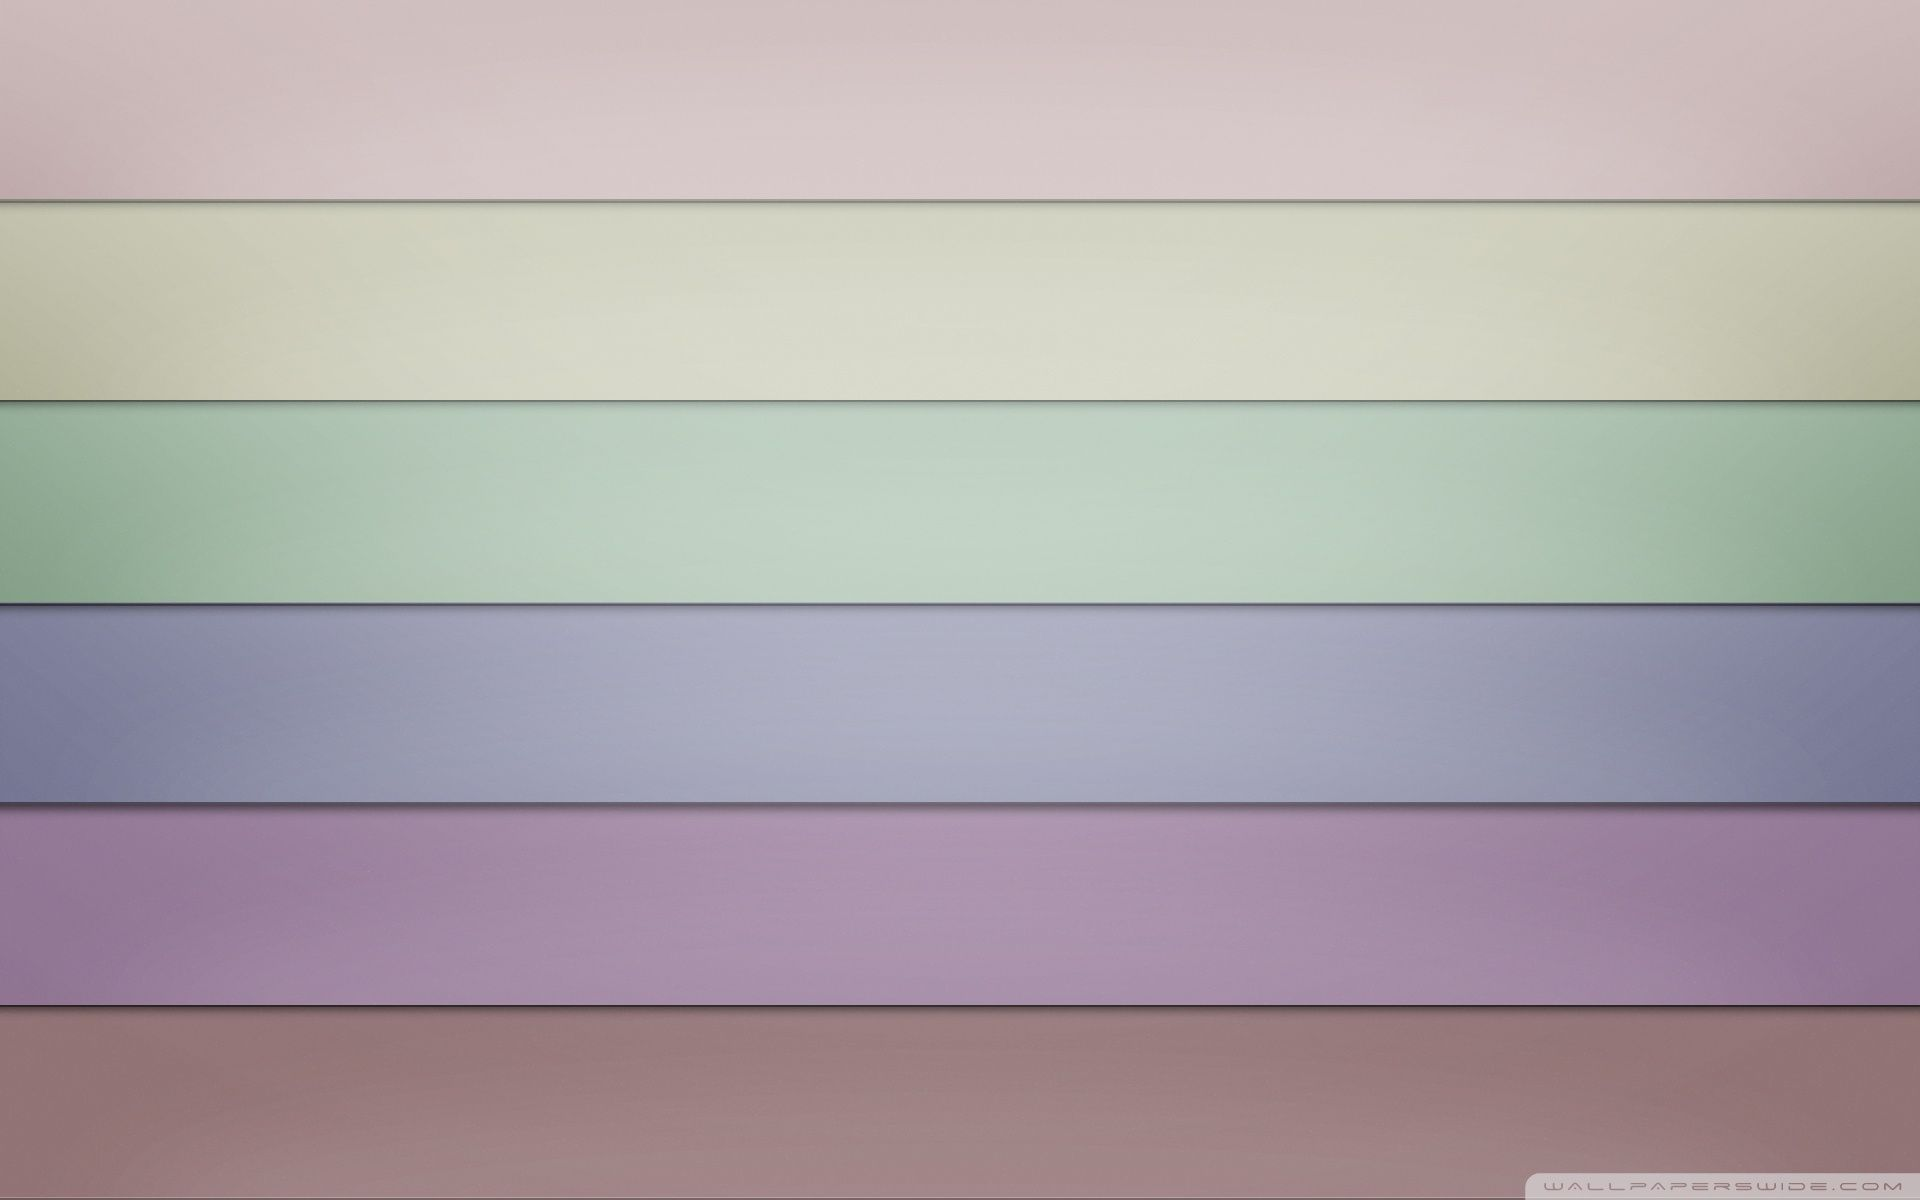 Fondos De Pantalla De Color Pastel Fondosmil